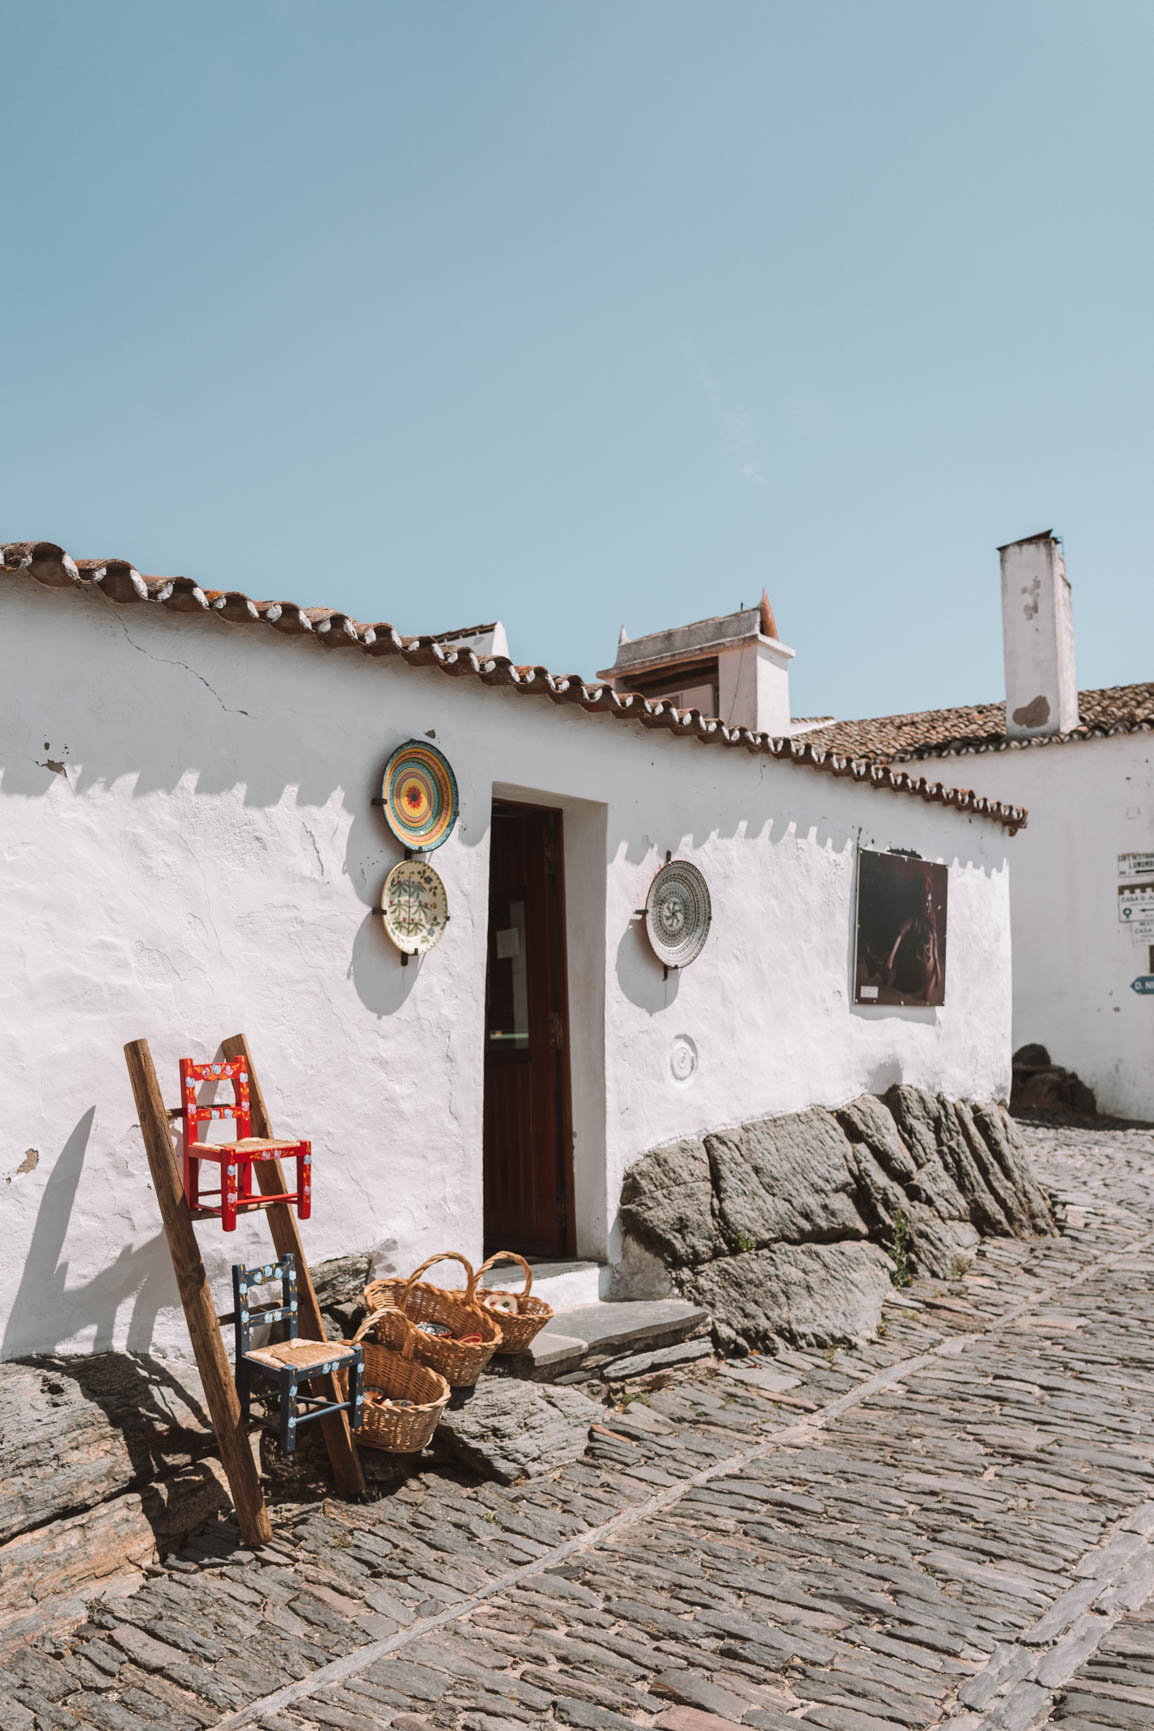 Monsaraz Village Alentejo - Exploring Portugal on a road trip #Europe #Portugal